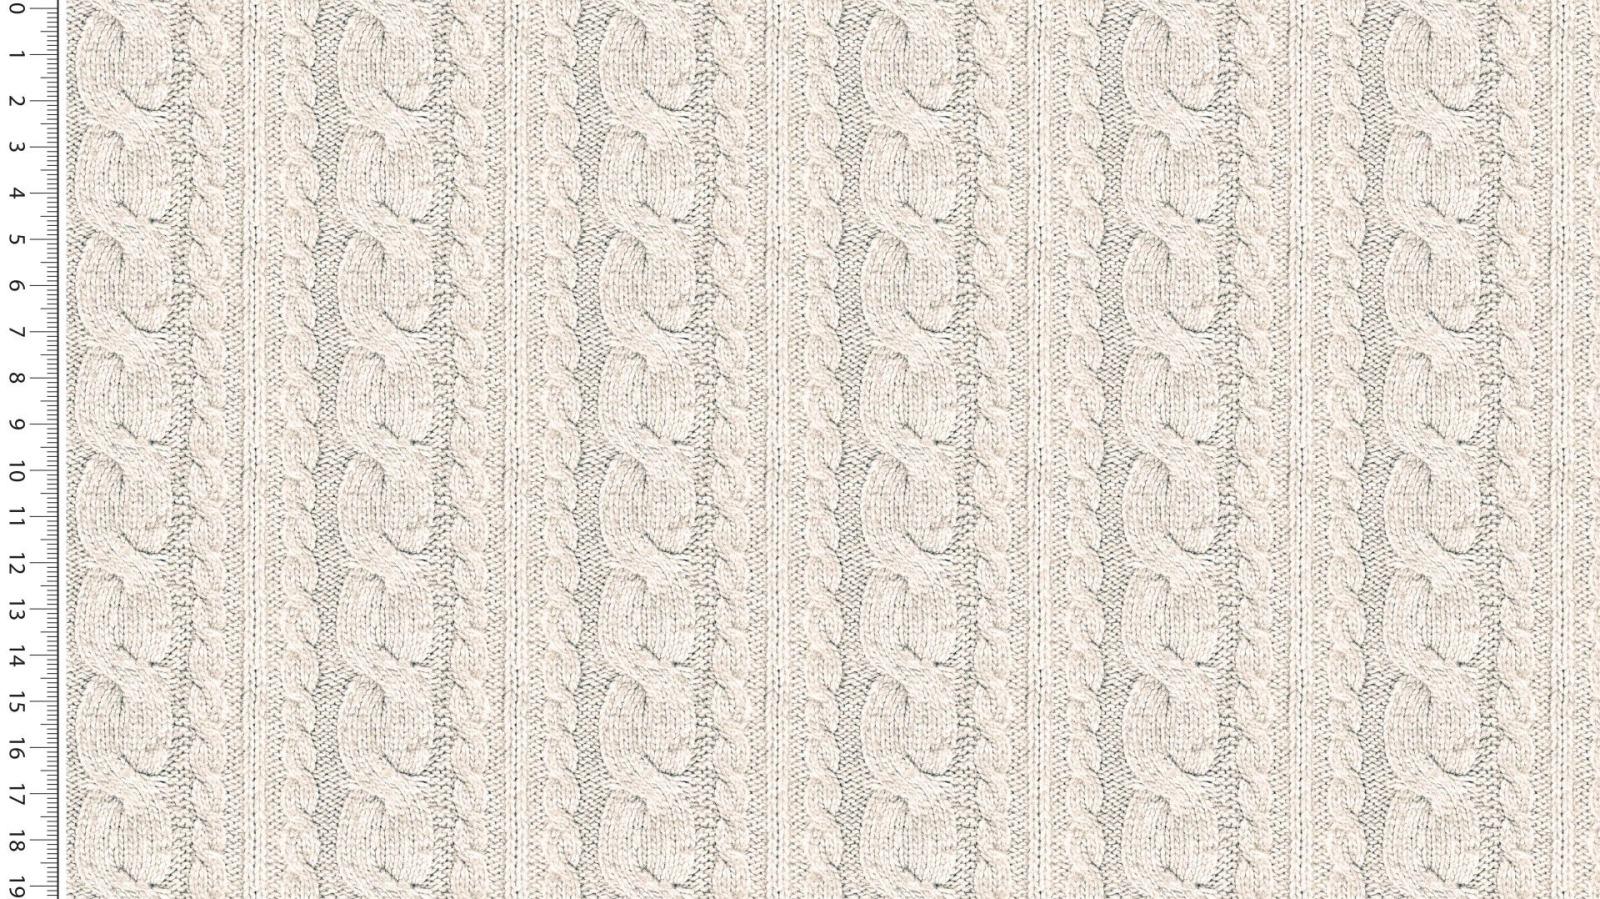 05m Sommersweat French Terry Sweat Digitaldruck